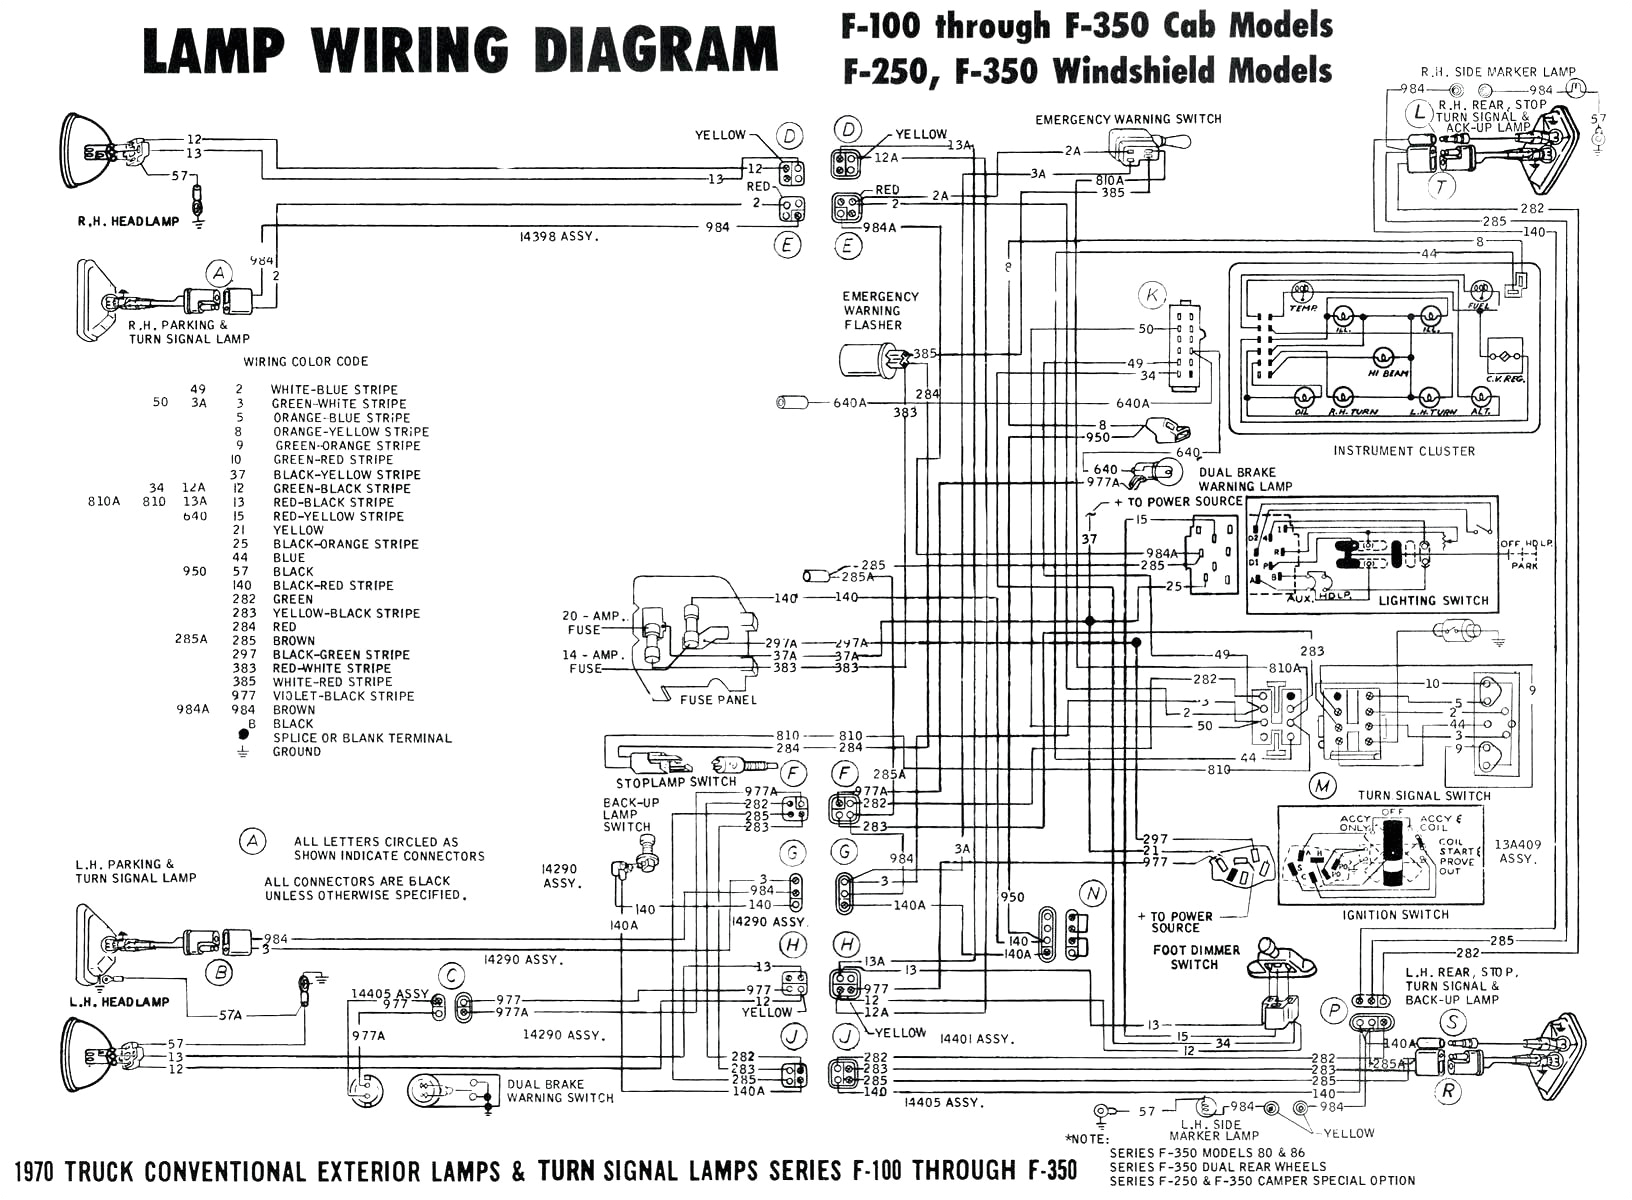 2012 hyundai sonata radio wiring diagram wiring diagram center 2006 hyundai sonata ac wiring diagram 2012